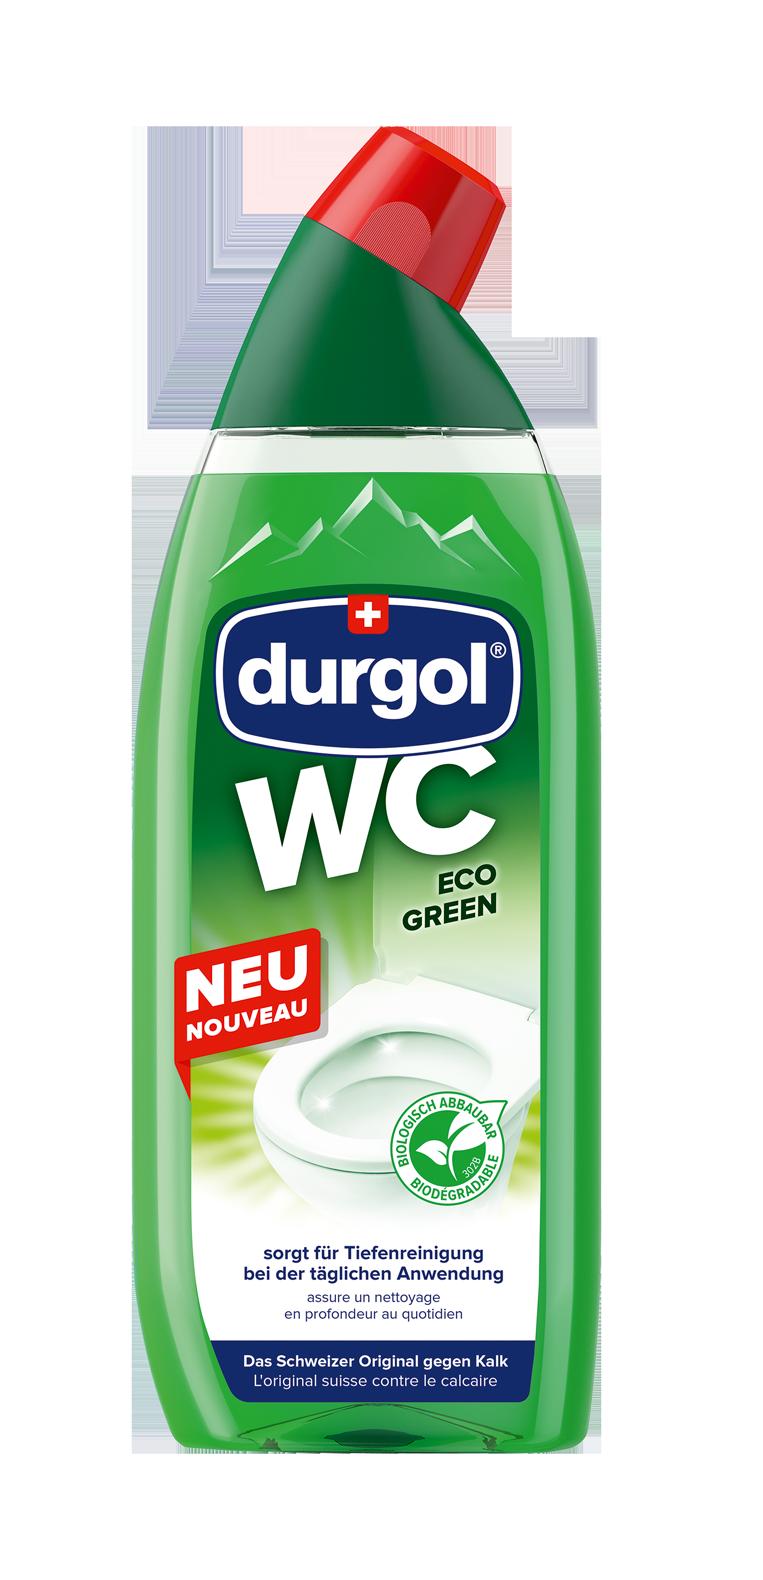 durgol WC Eco Green